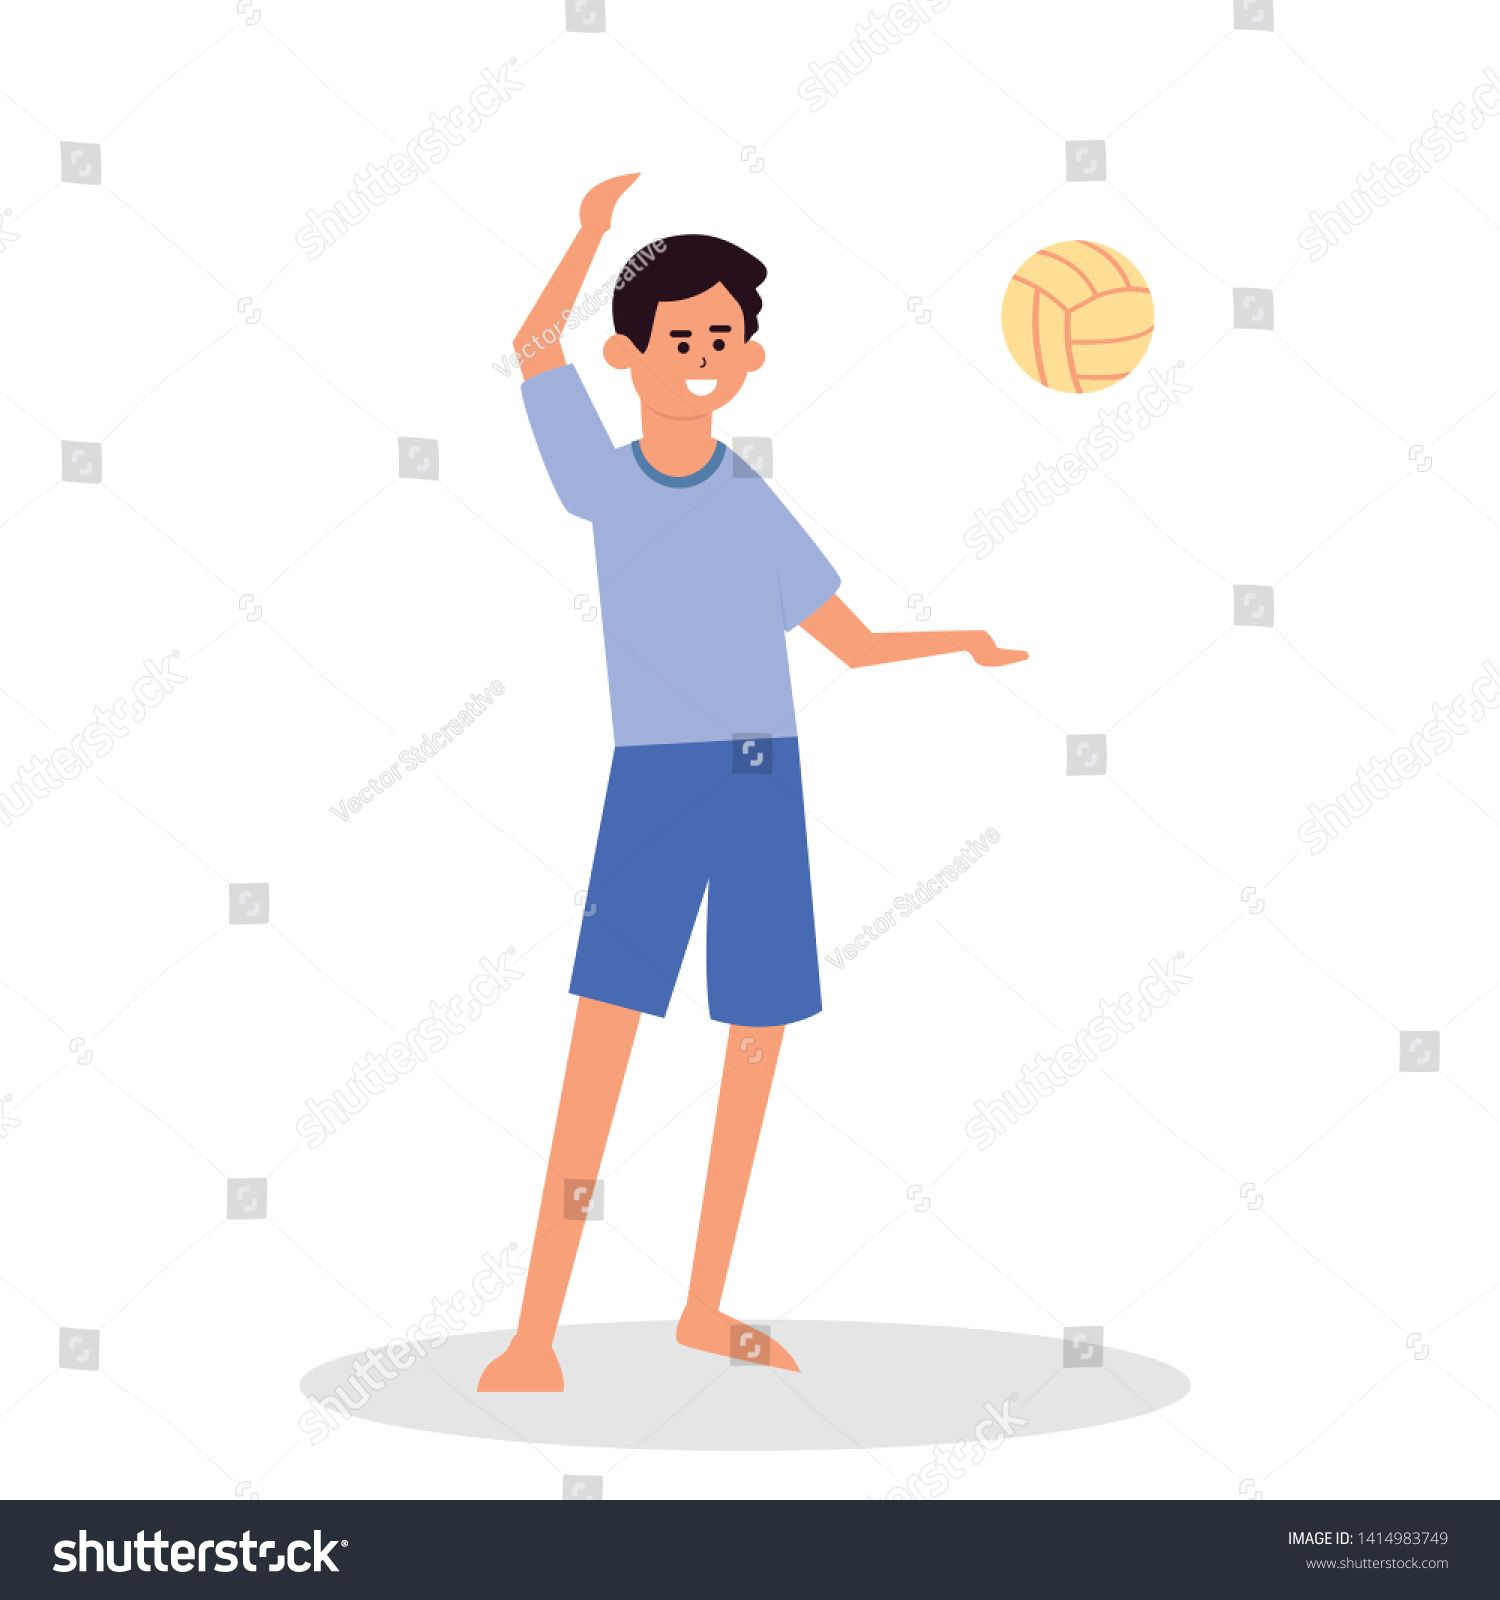 Summer Activities And Sport On Beach Flat Cartoon Happy Boy Play Volleyball Throwing Ball Happy Smiling Men Having Fun Boys Playing Cartoon Boy Smiling Man